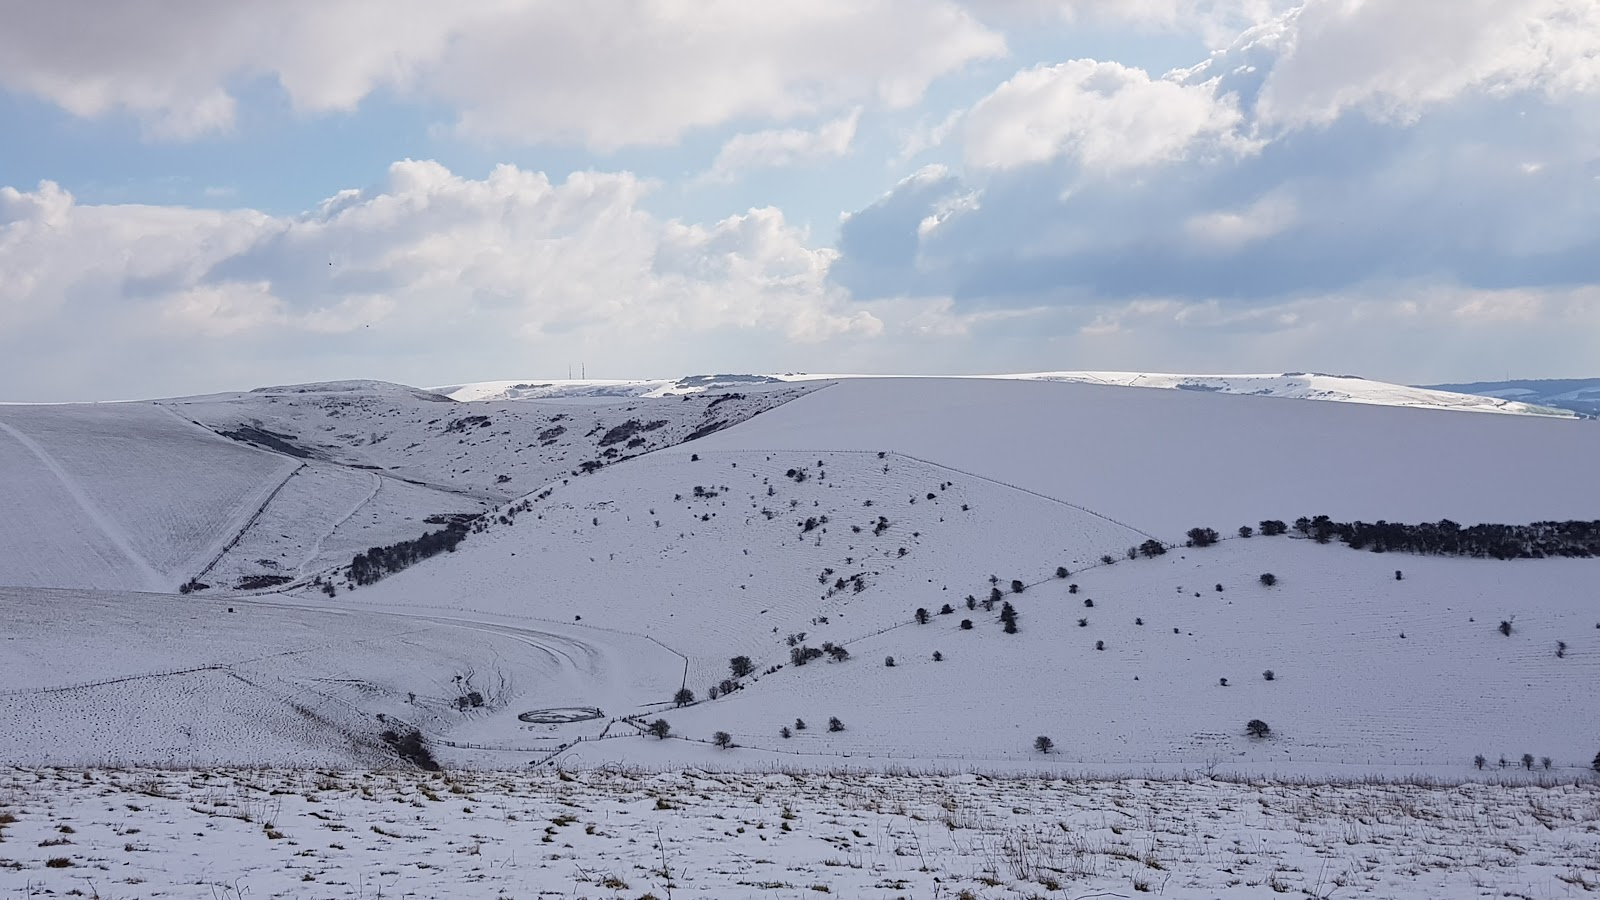 Southerham snow6